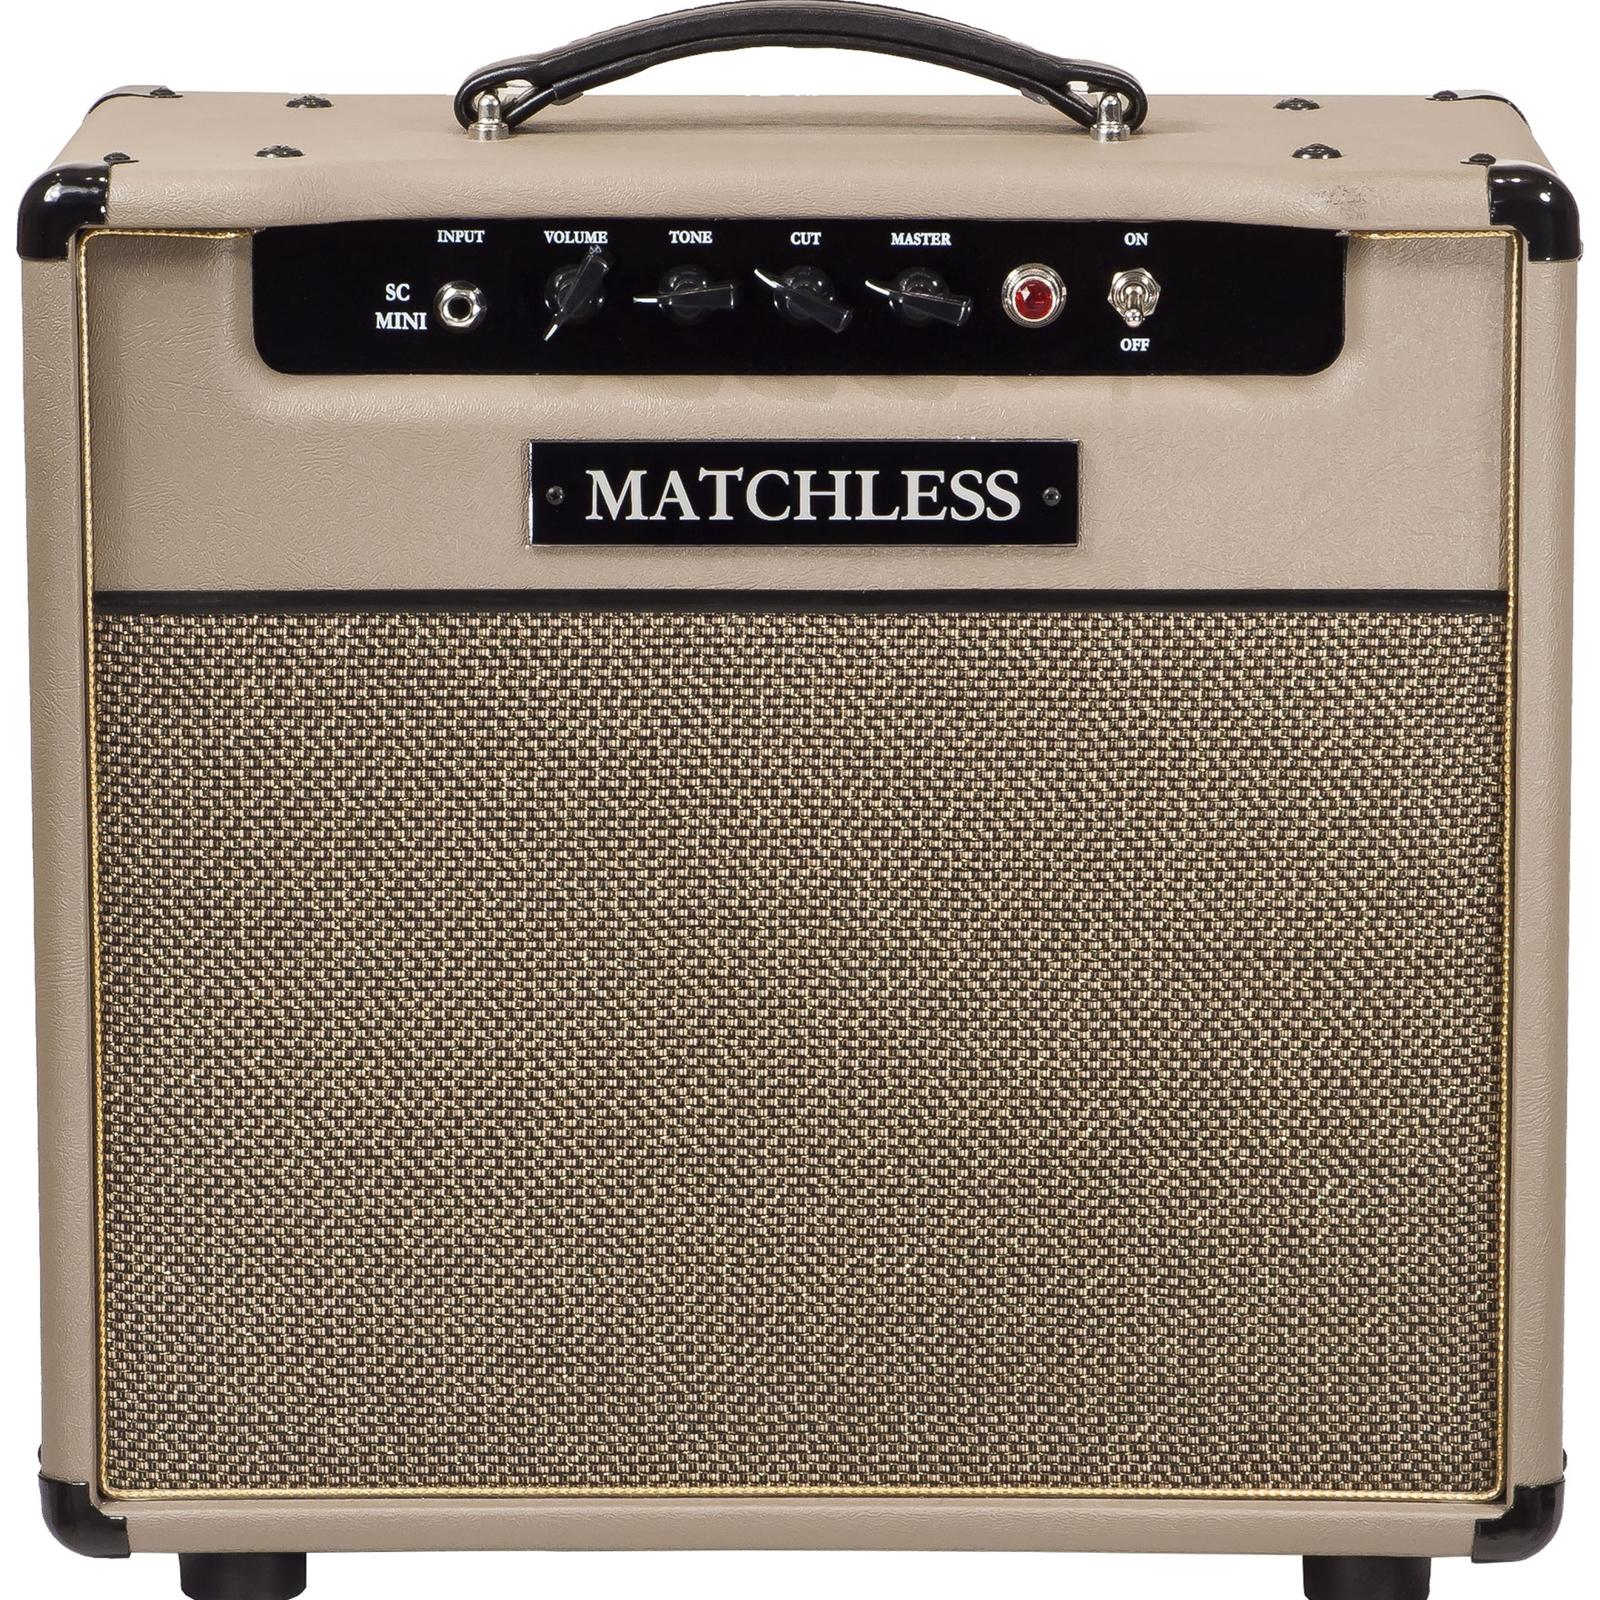 Matchless Spitfire 15 Amplifier